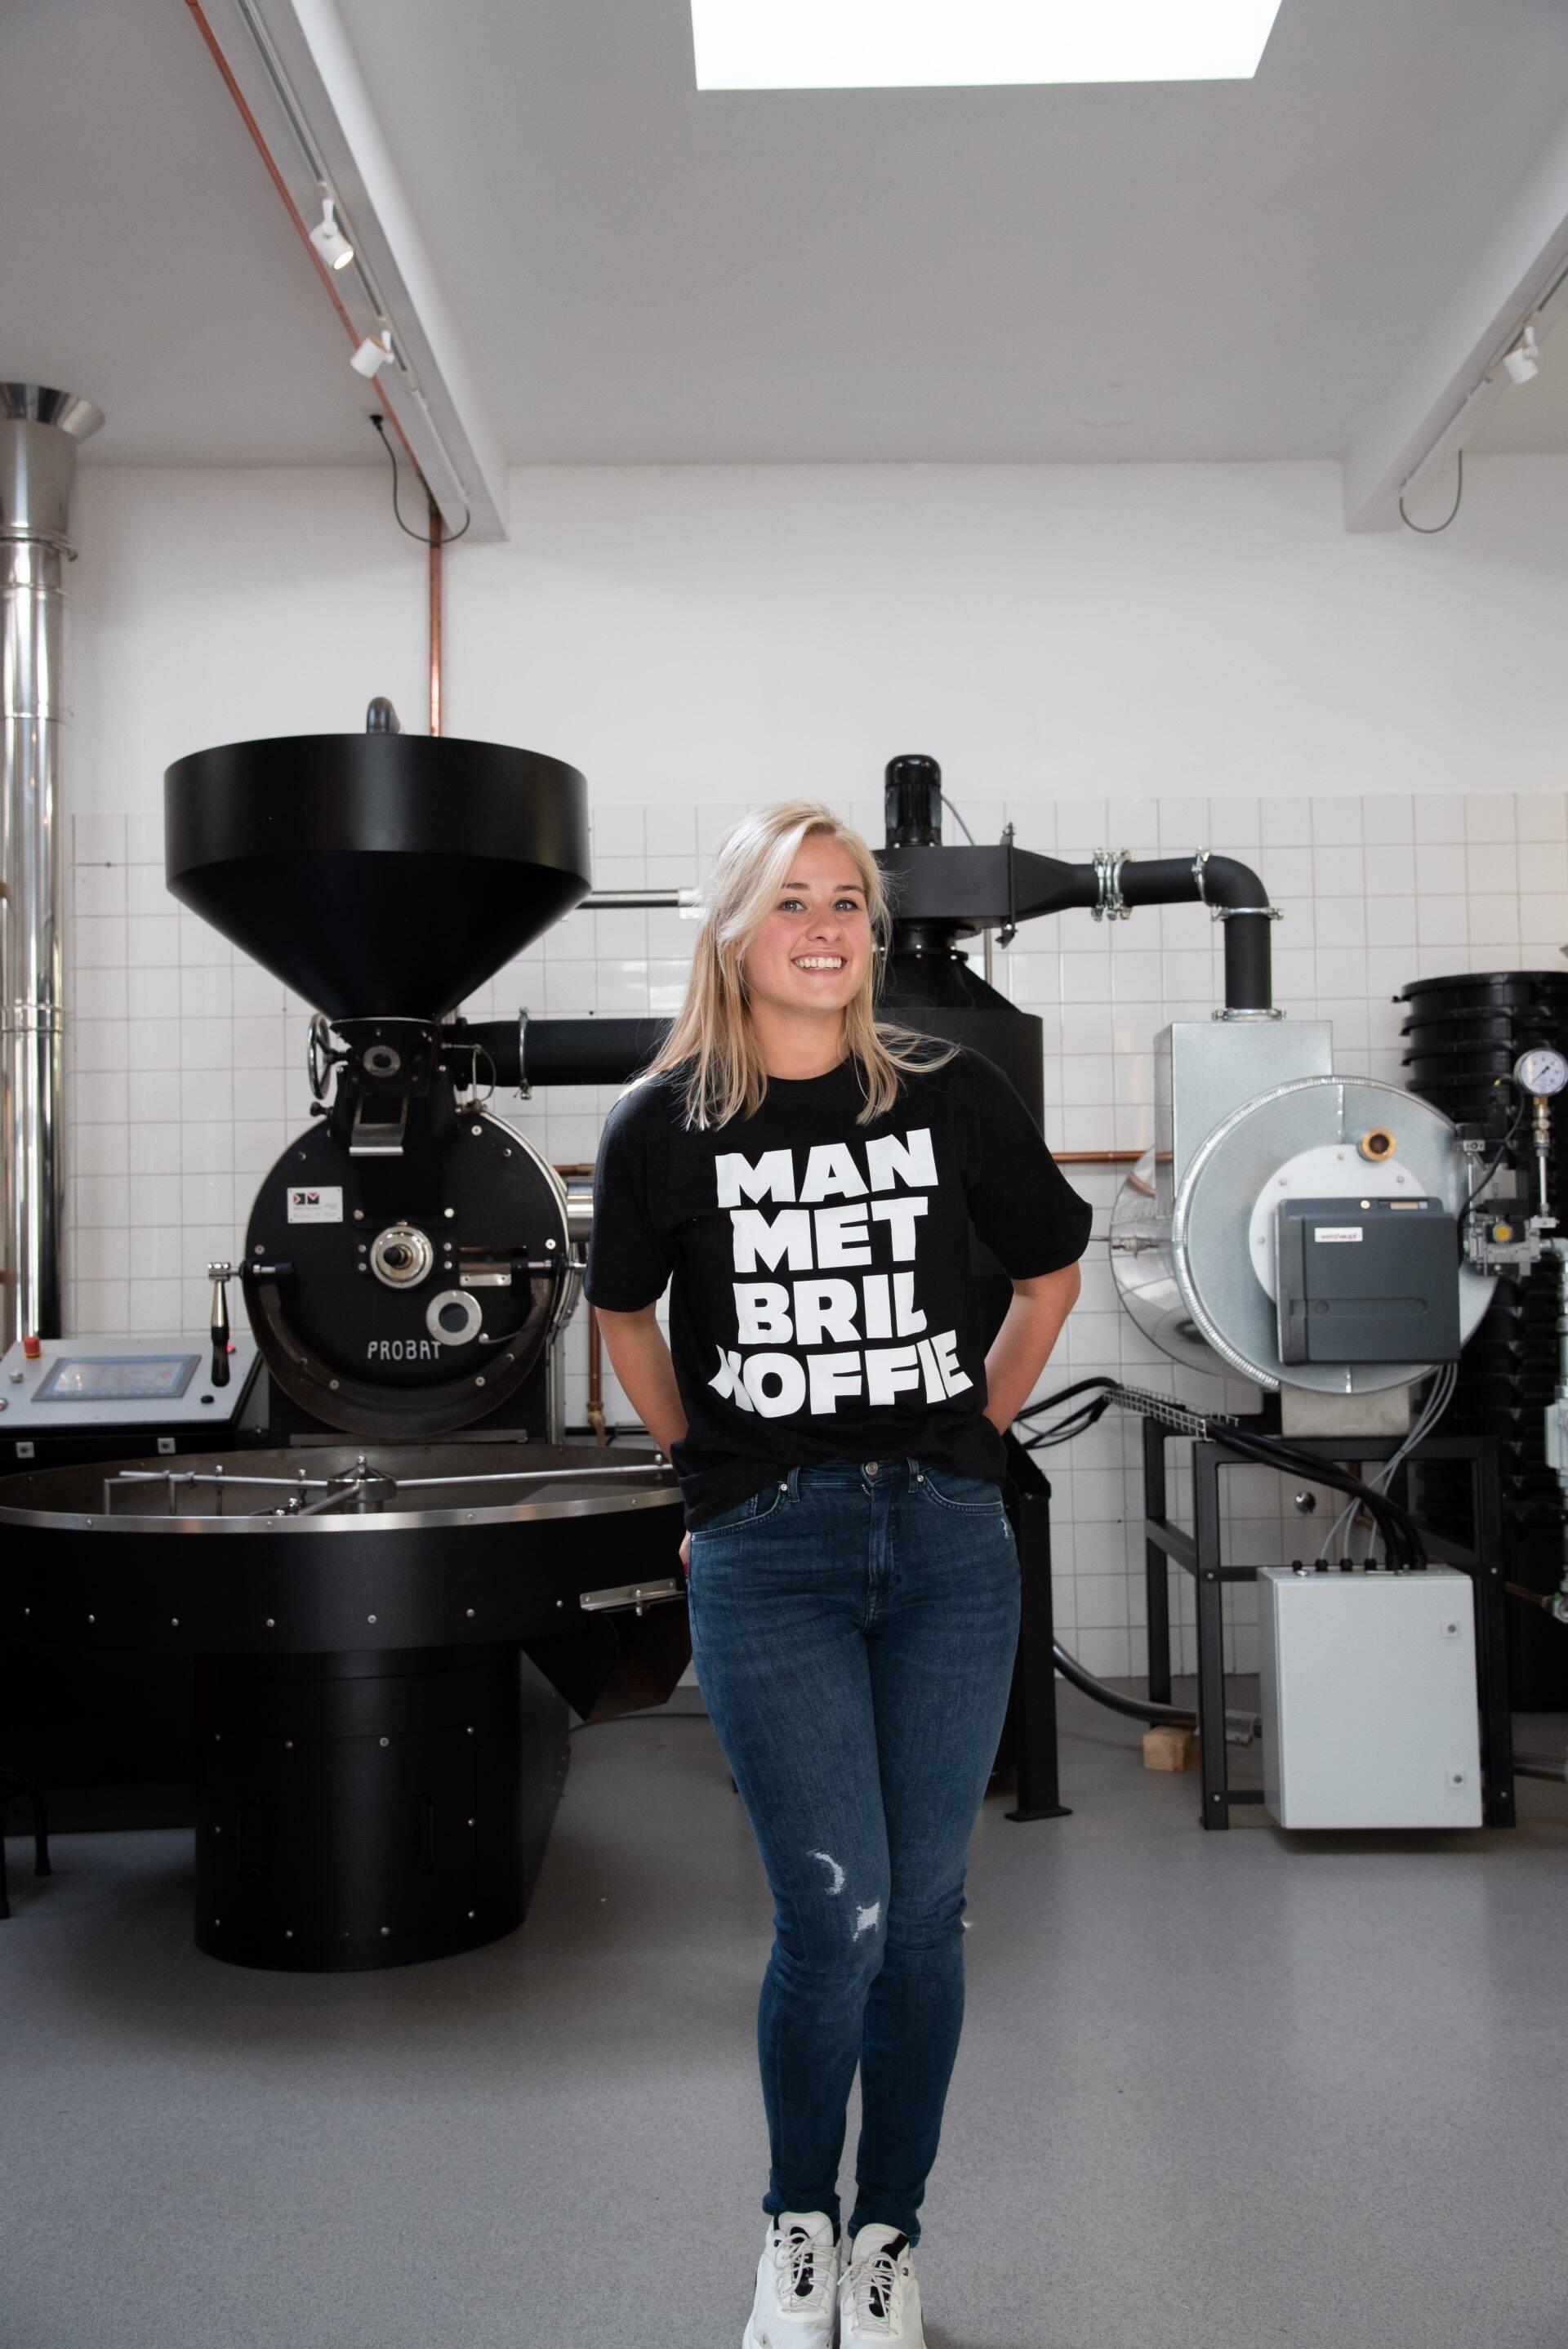 Man met Bril koffie in Rotterdam